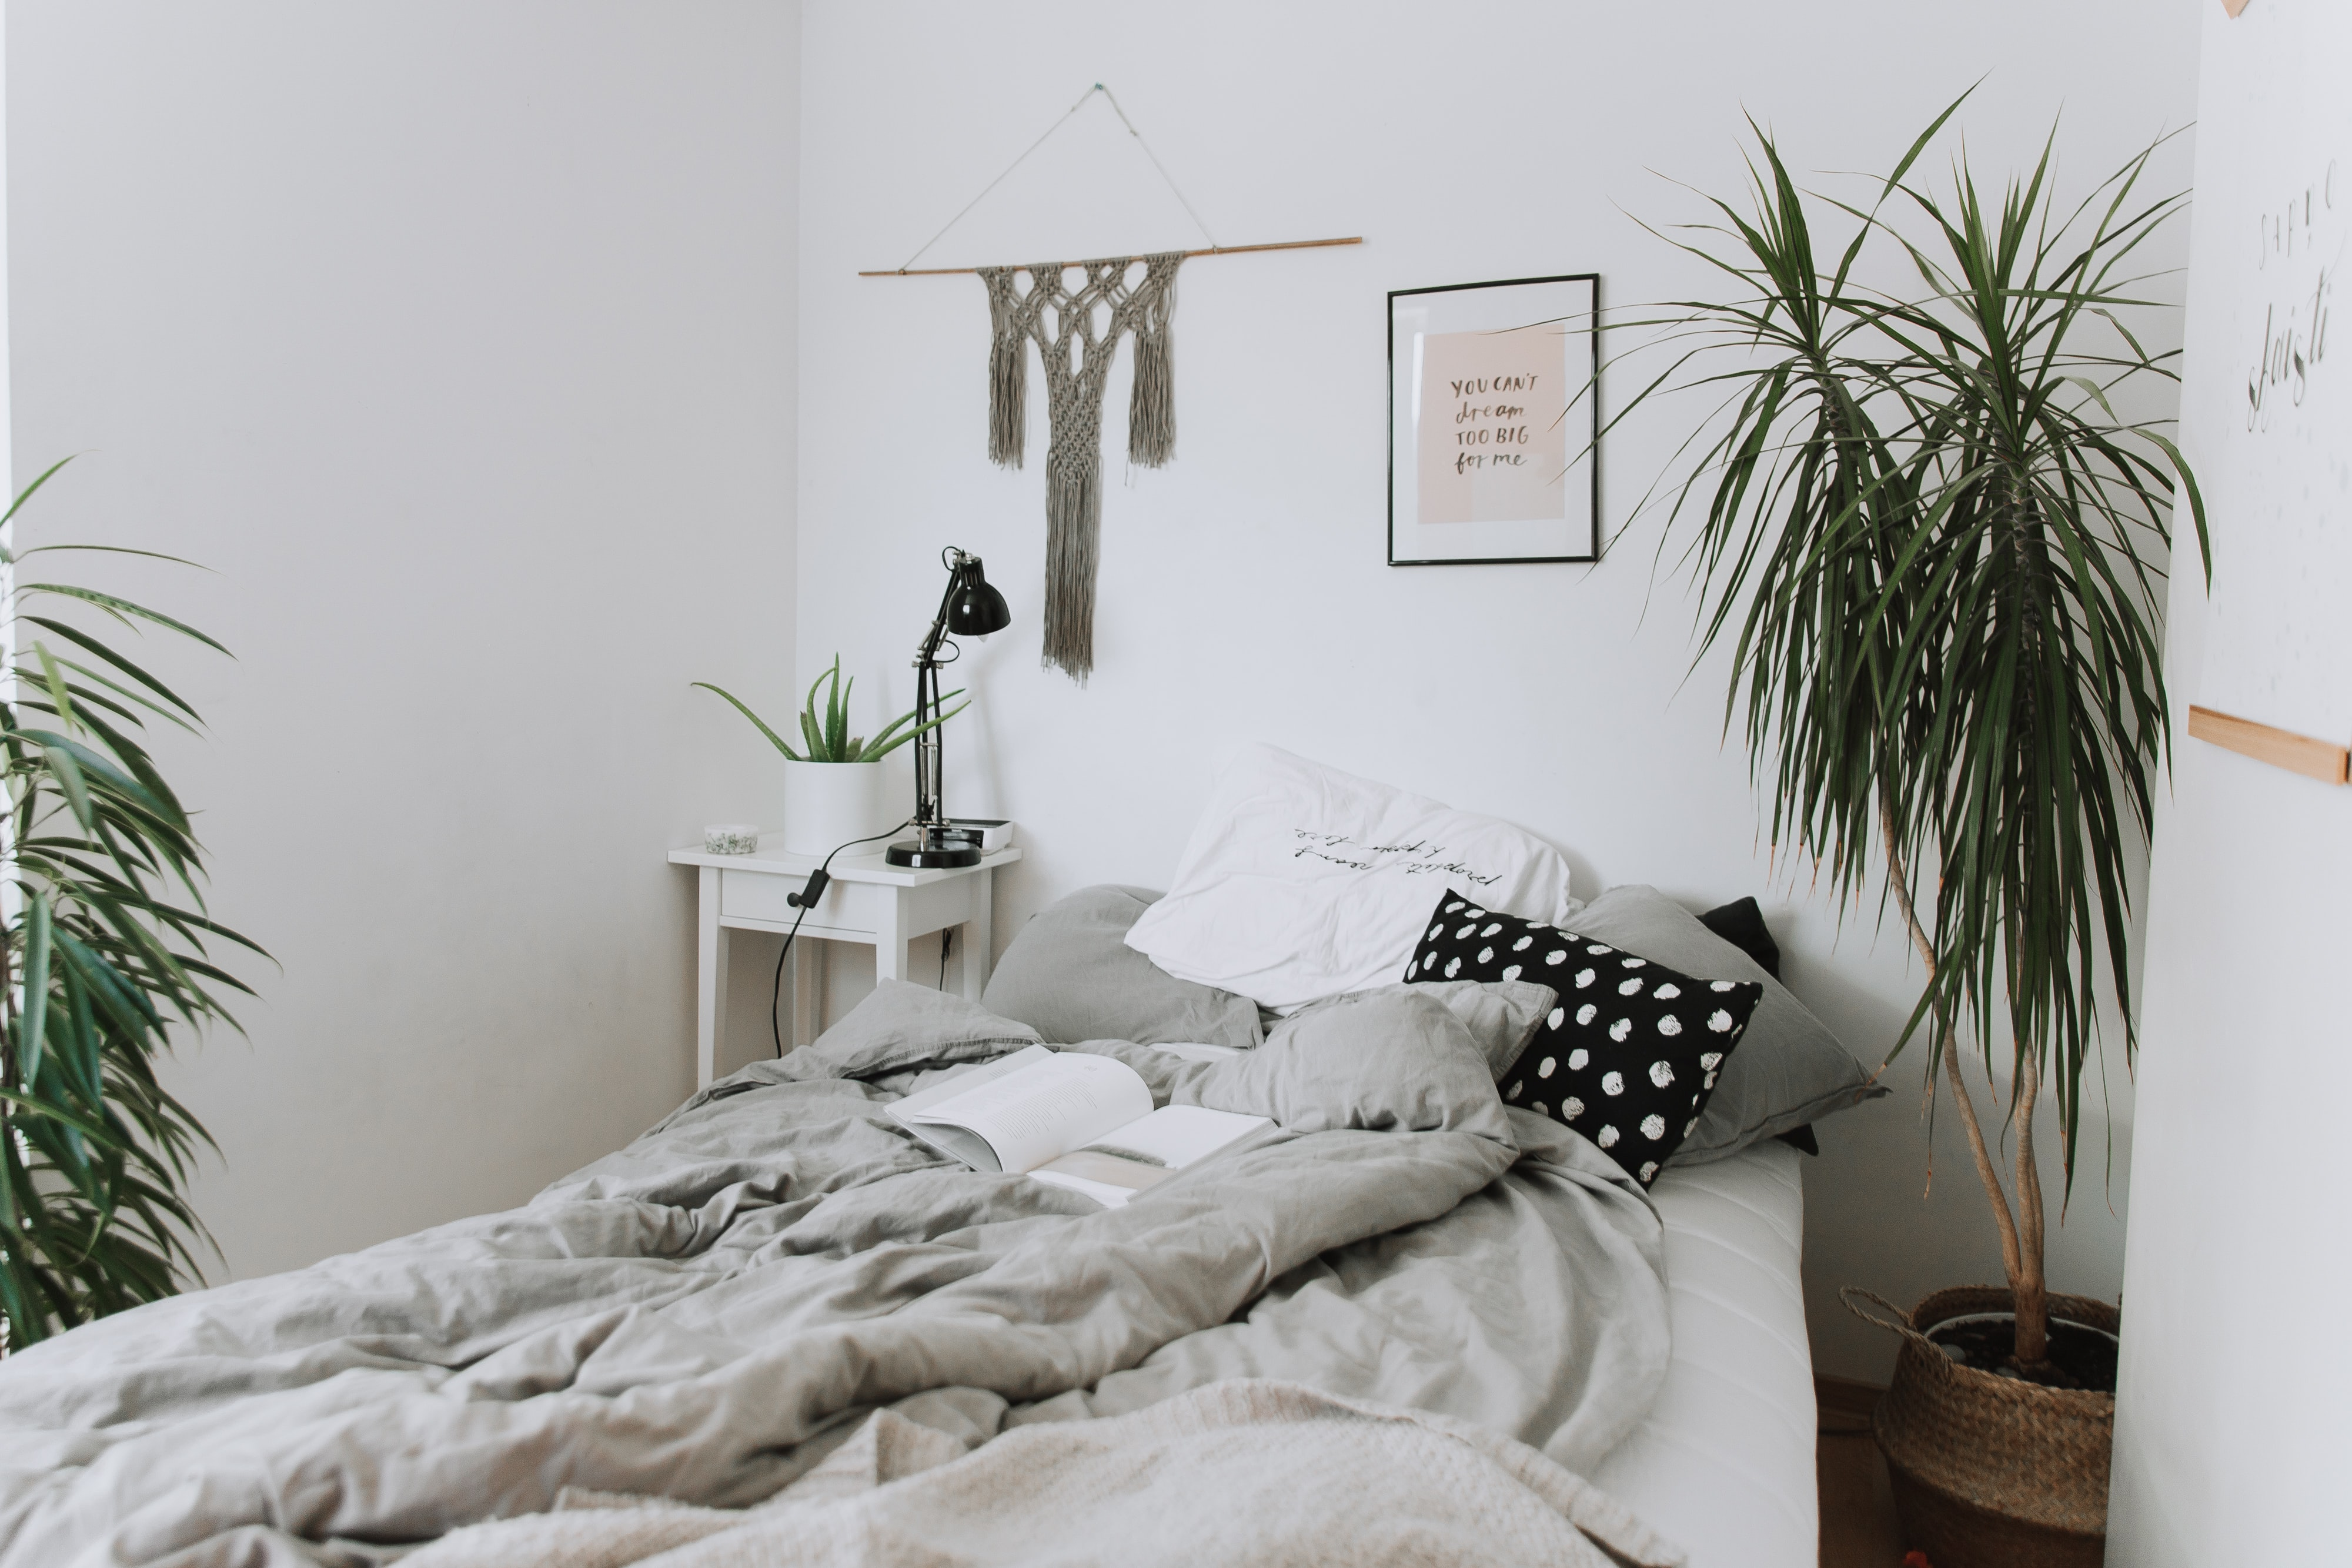 two green indoor plants near gray bedspread